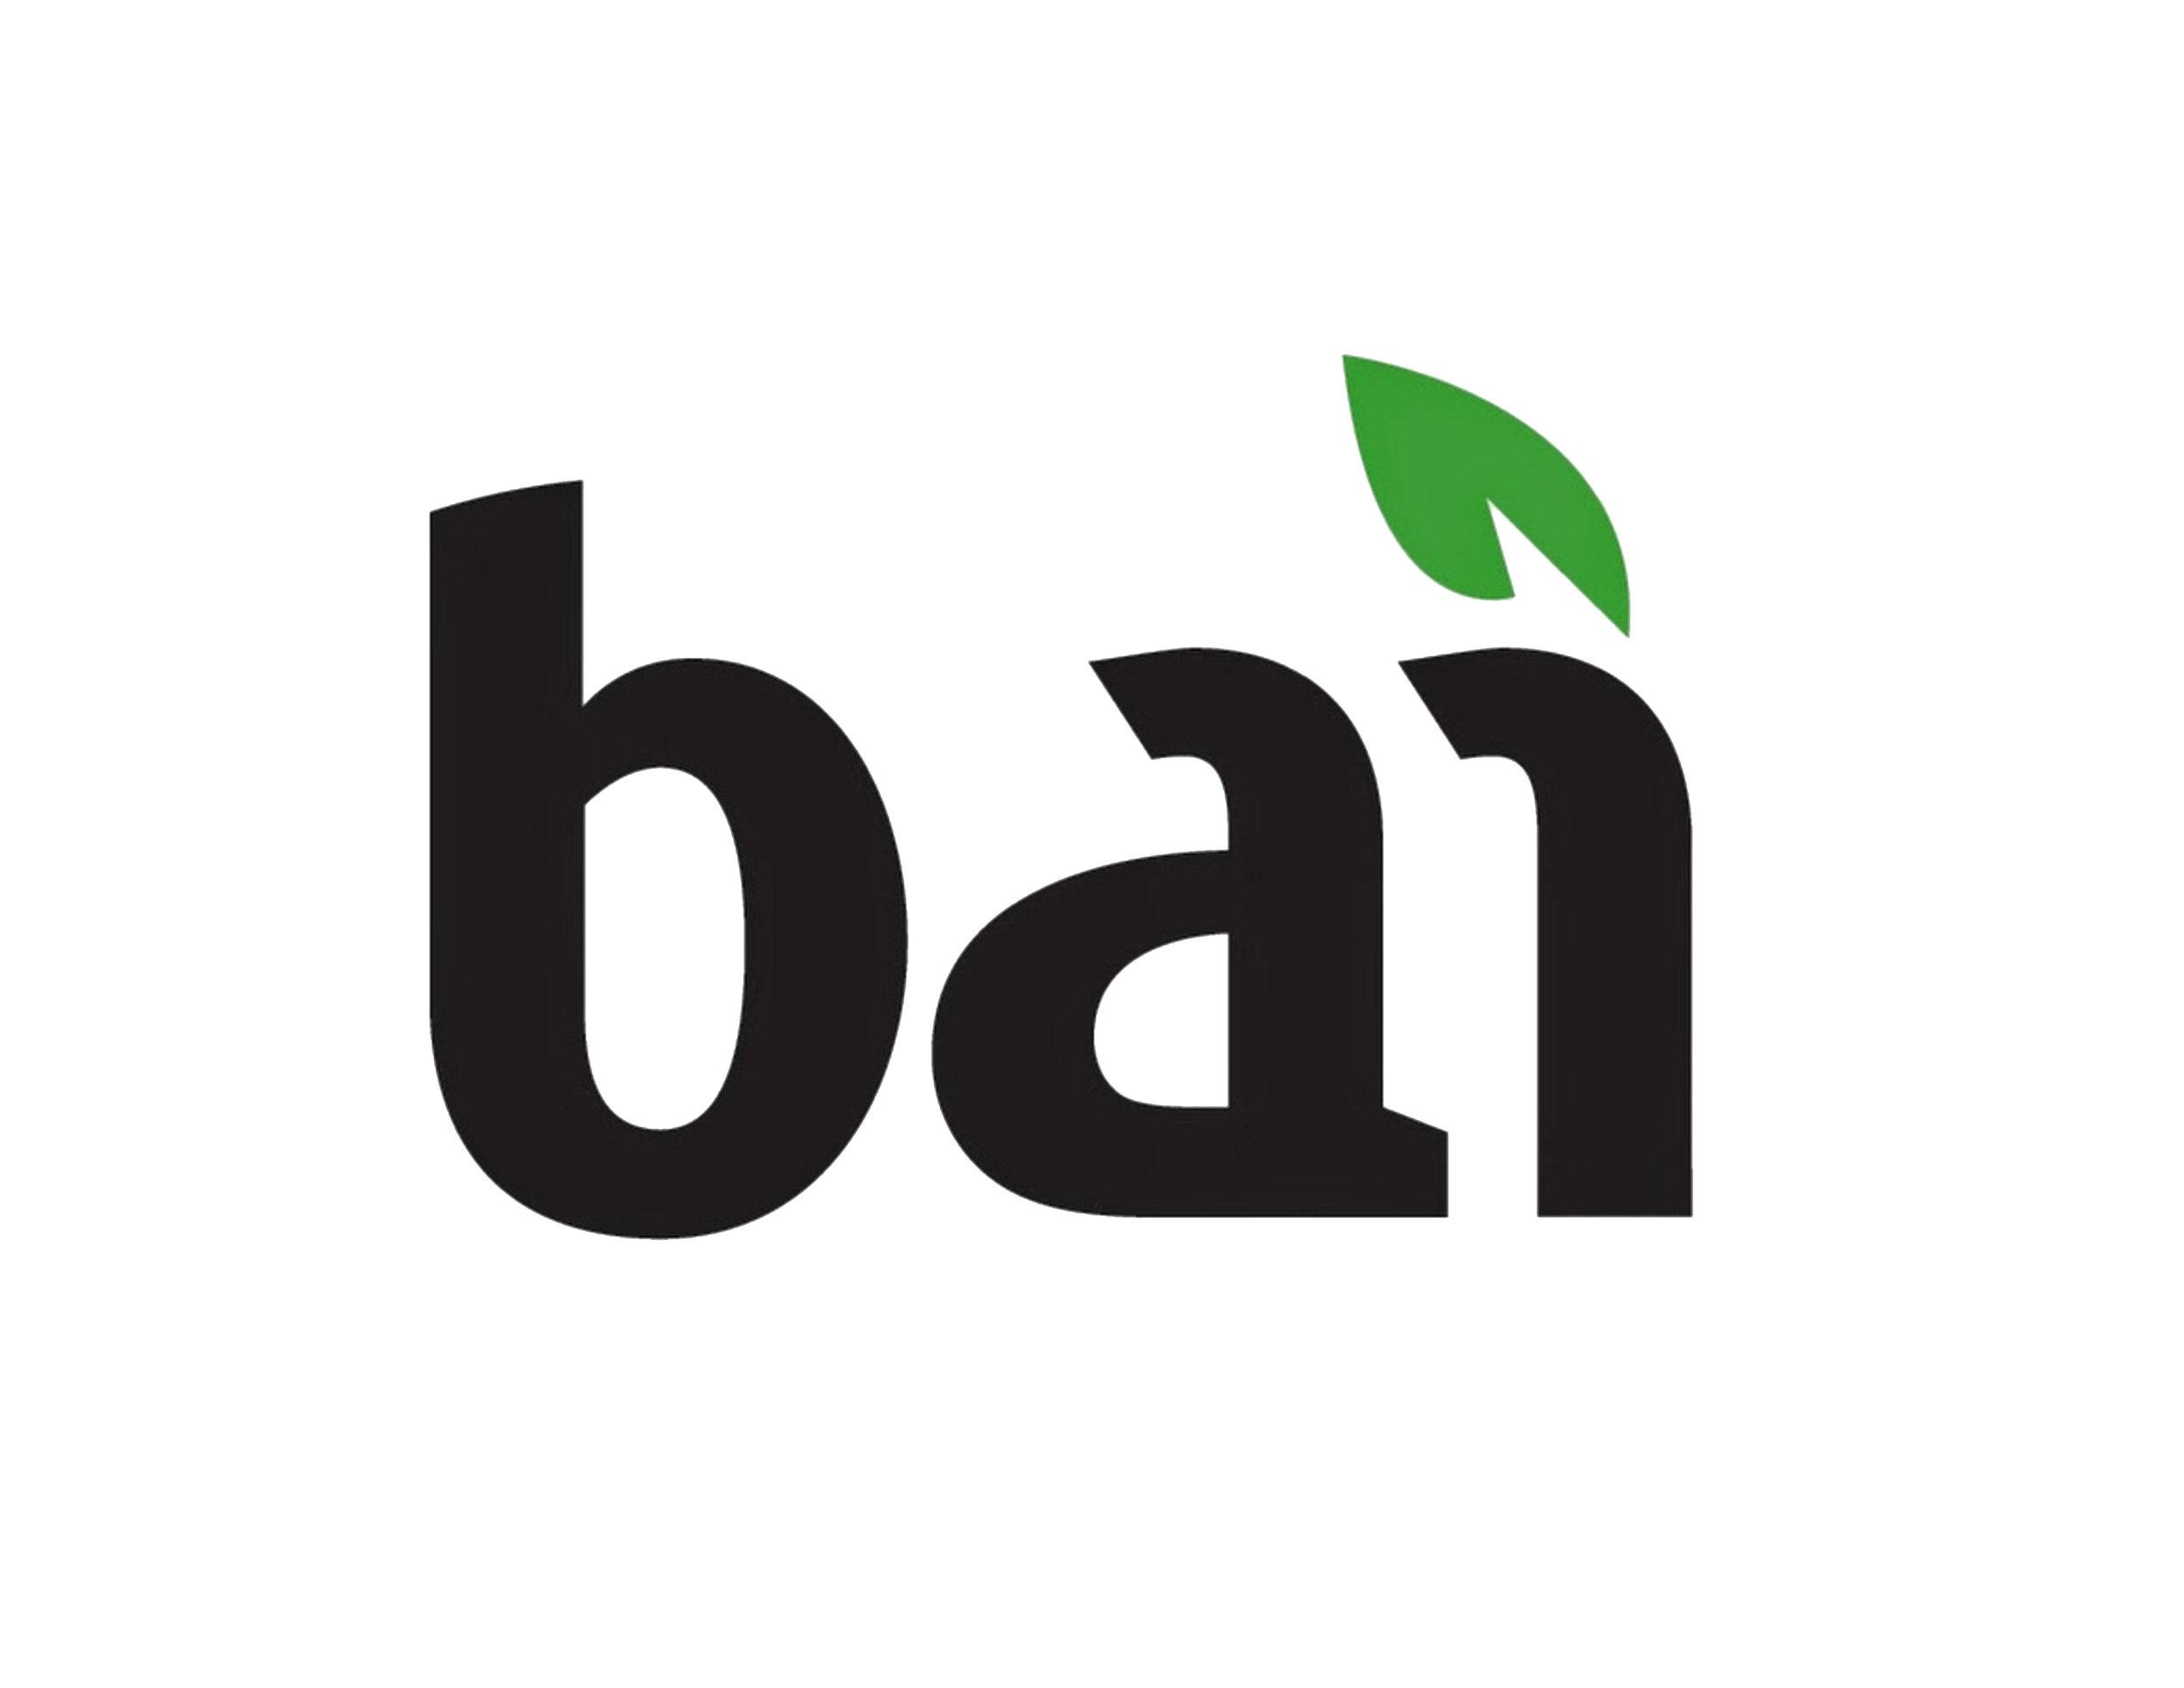 Bai.logo copy.jpg